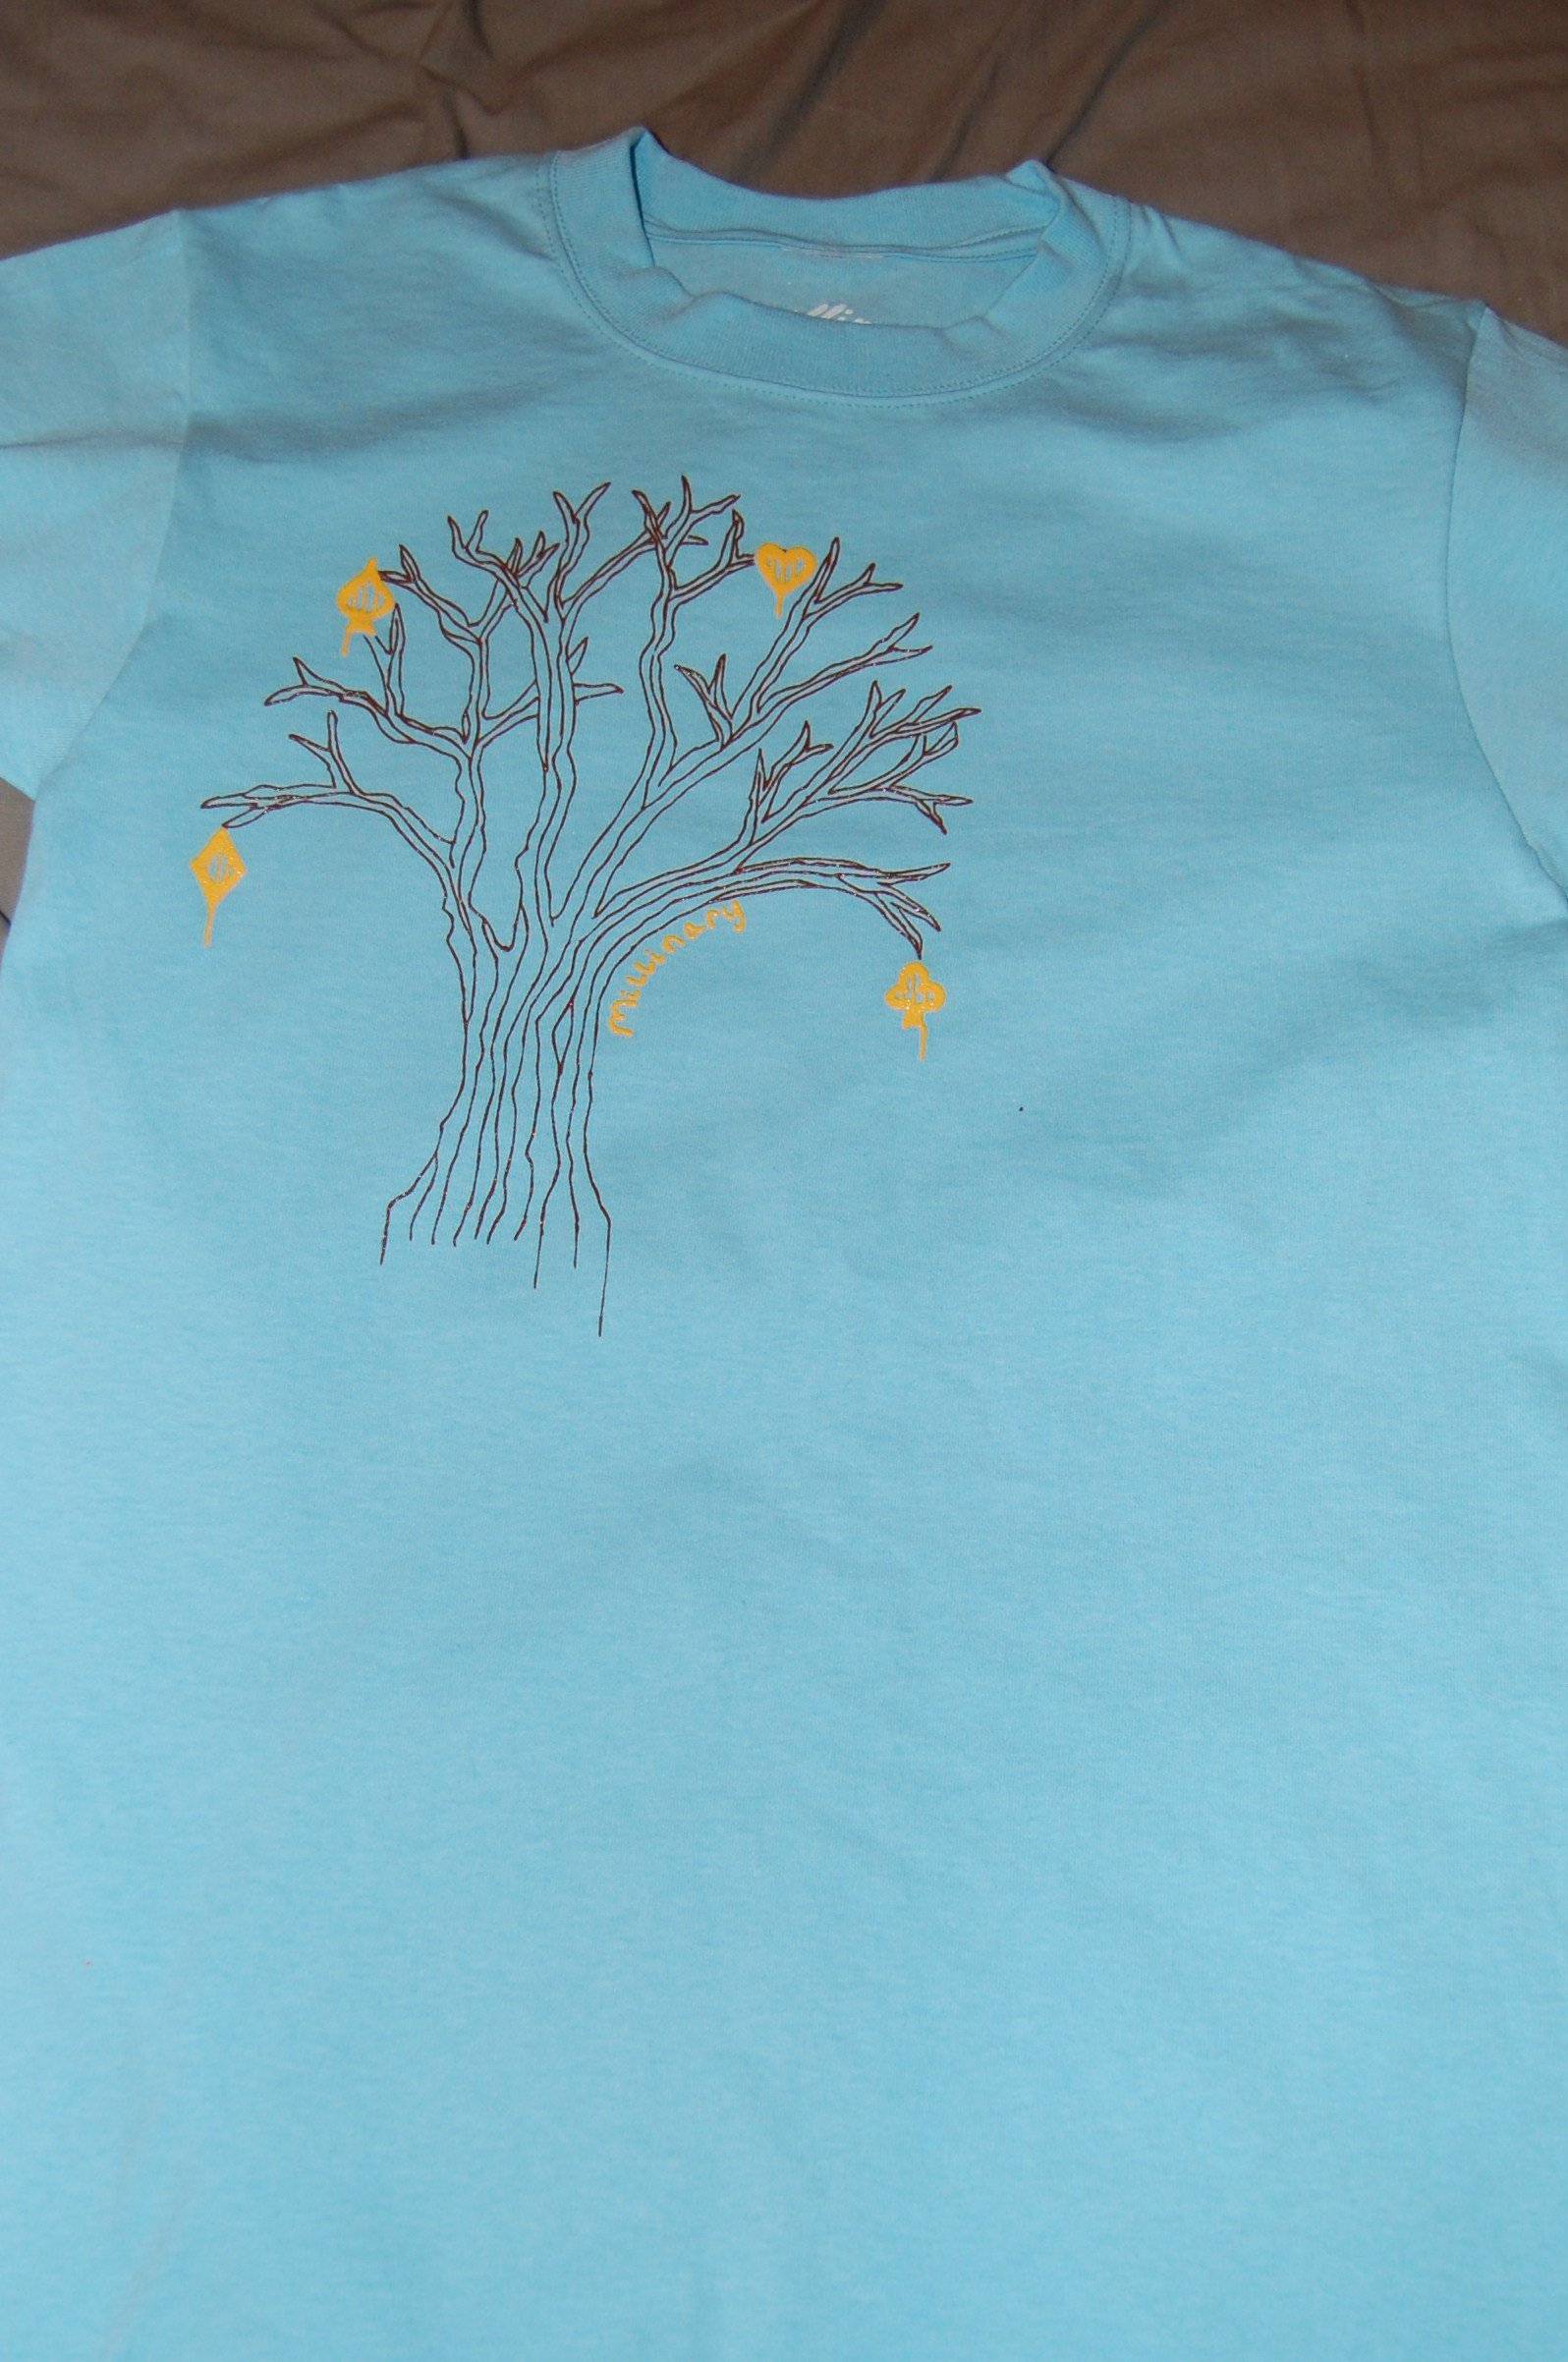 Another shirt